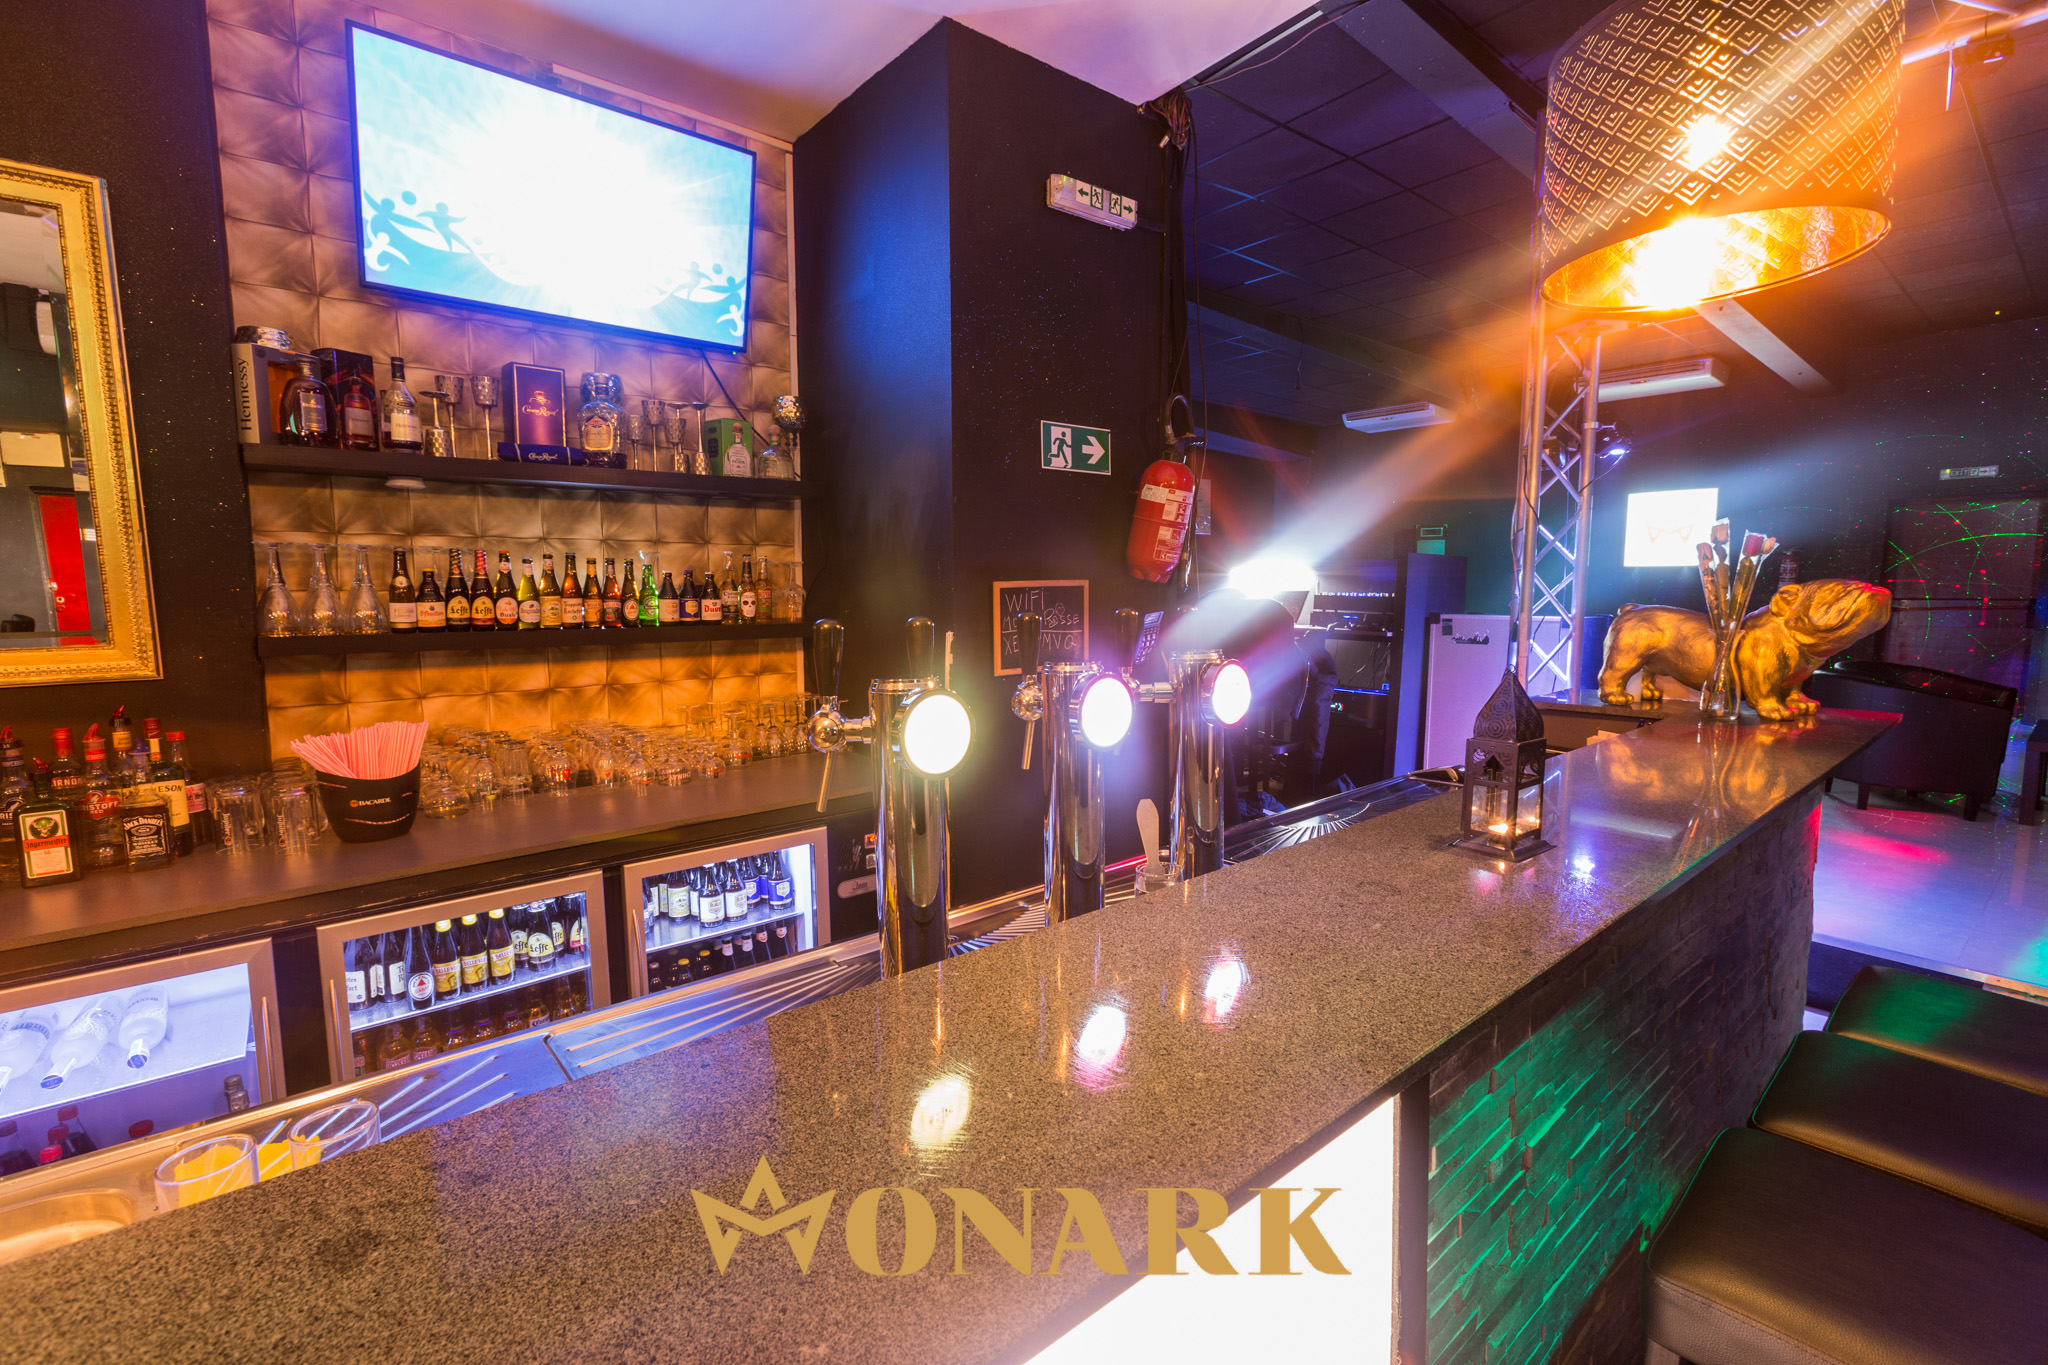 Monark Bar Lounge